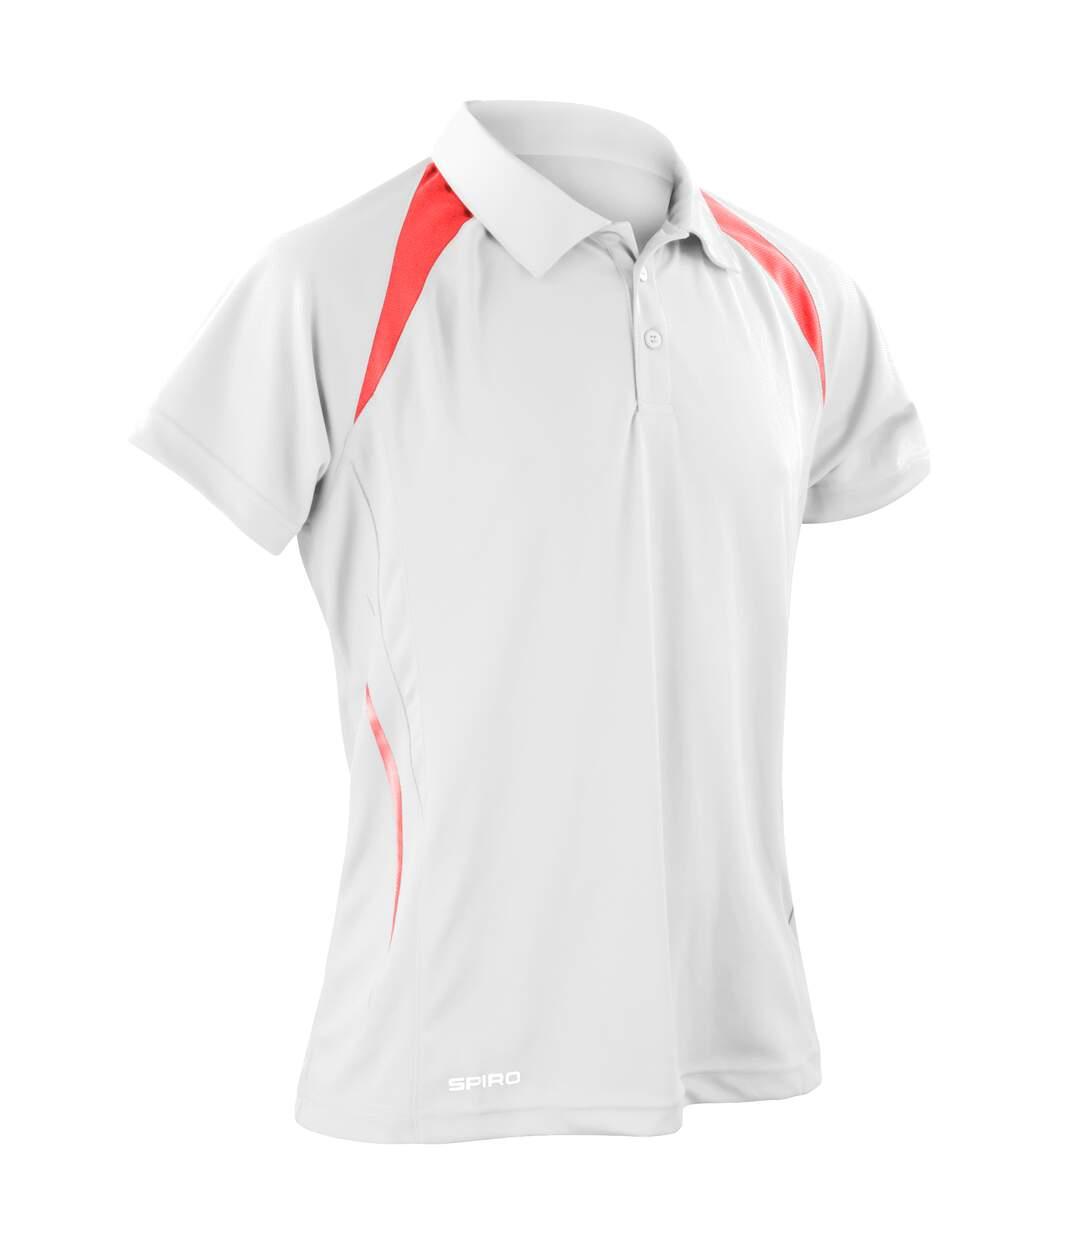 Spiro Mens Sports Team Spirit Performance Polo Shirt (Black/White) - UTRW1470